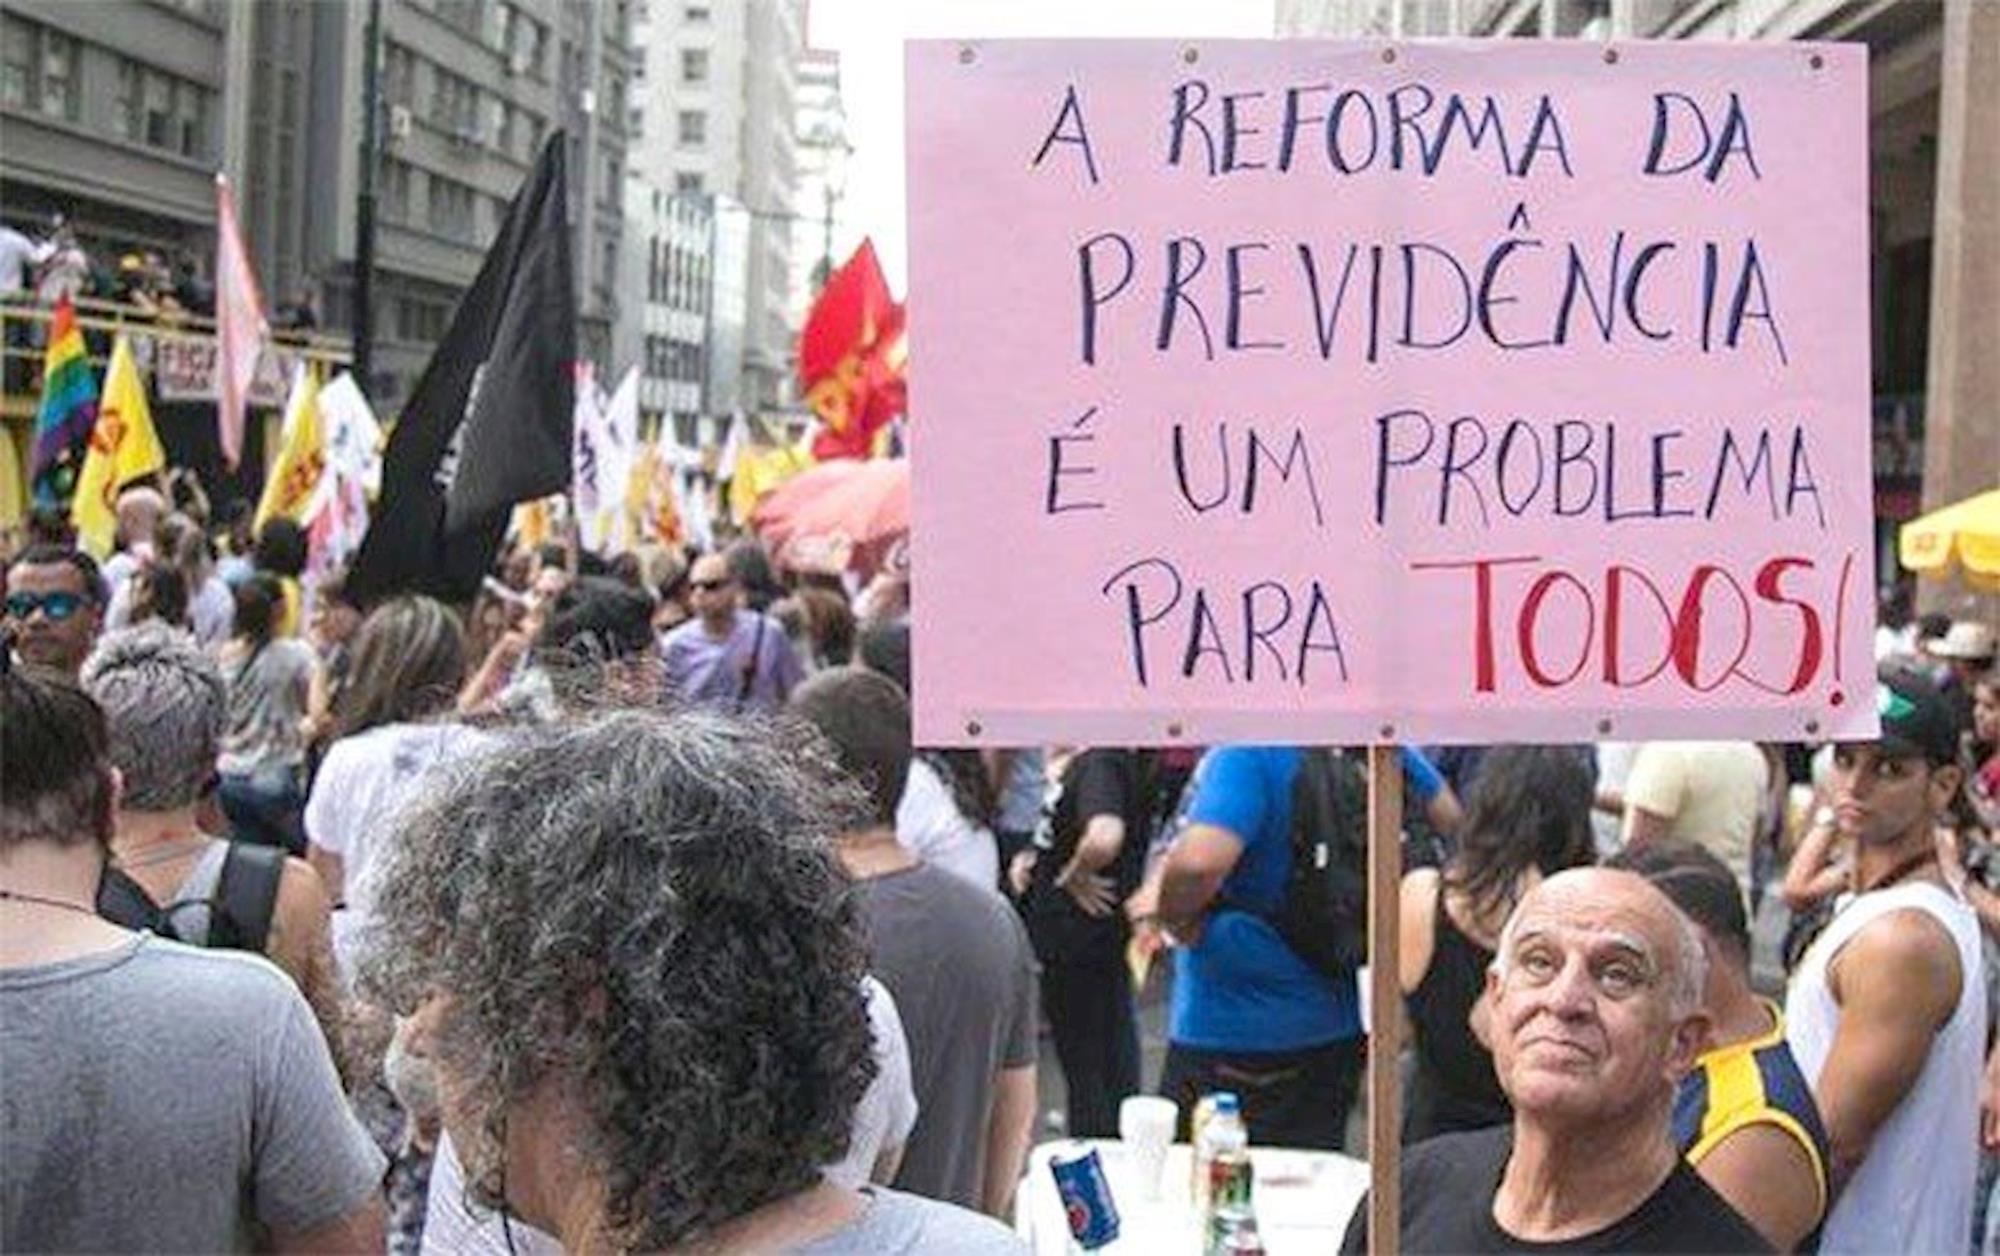 reforma, previdência, protesto, aposentadoria, GUILHERME SANTOS/SUL21